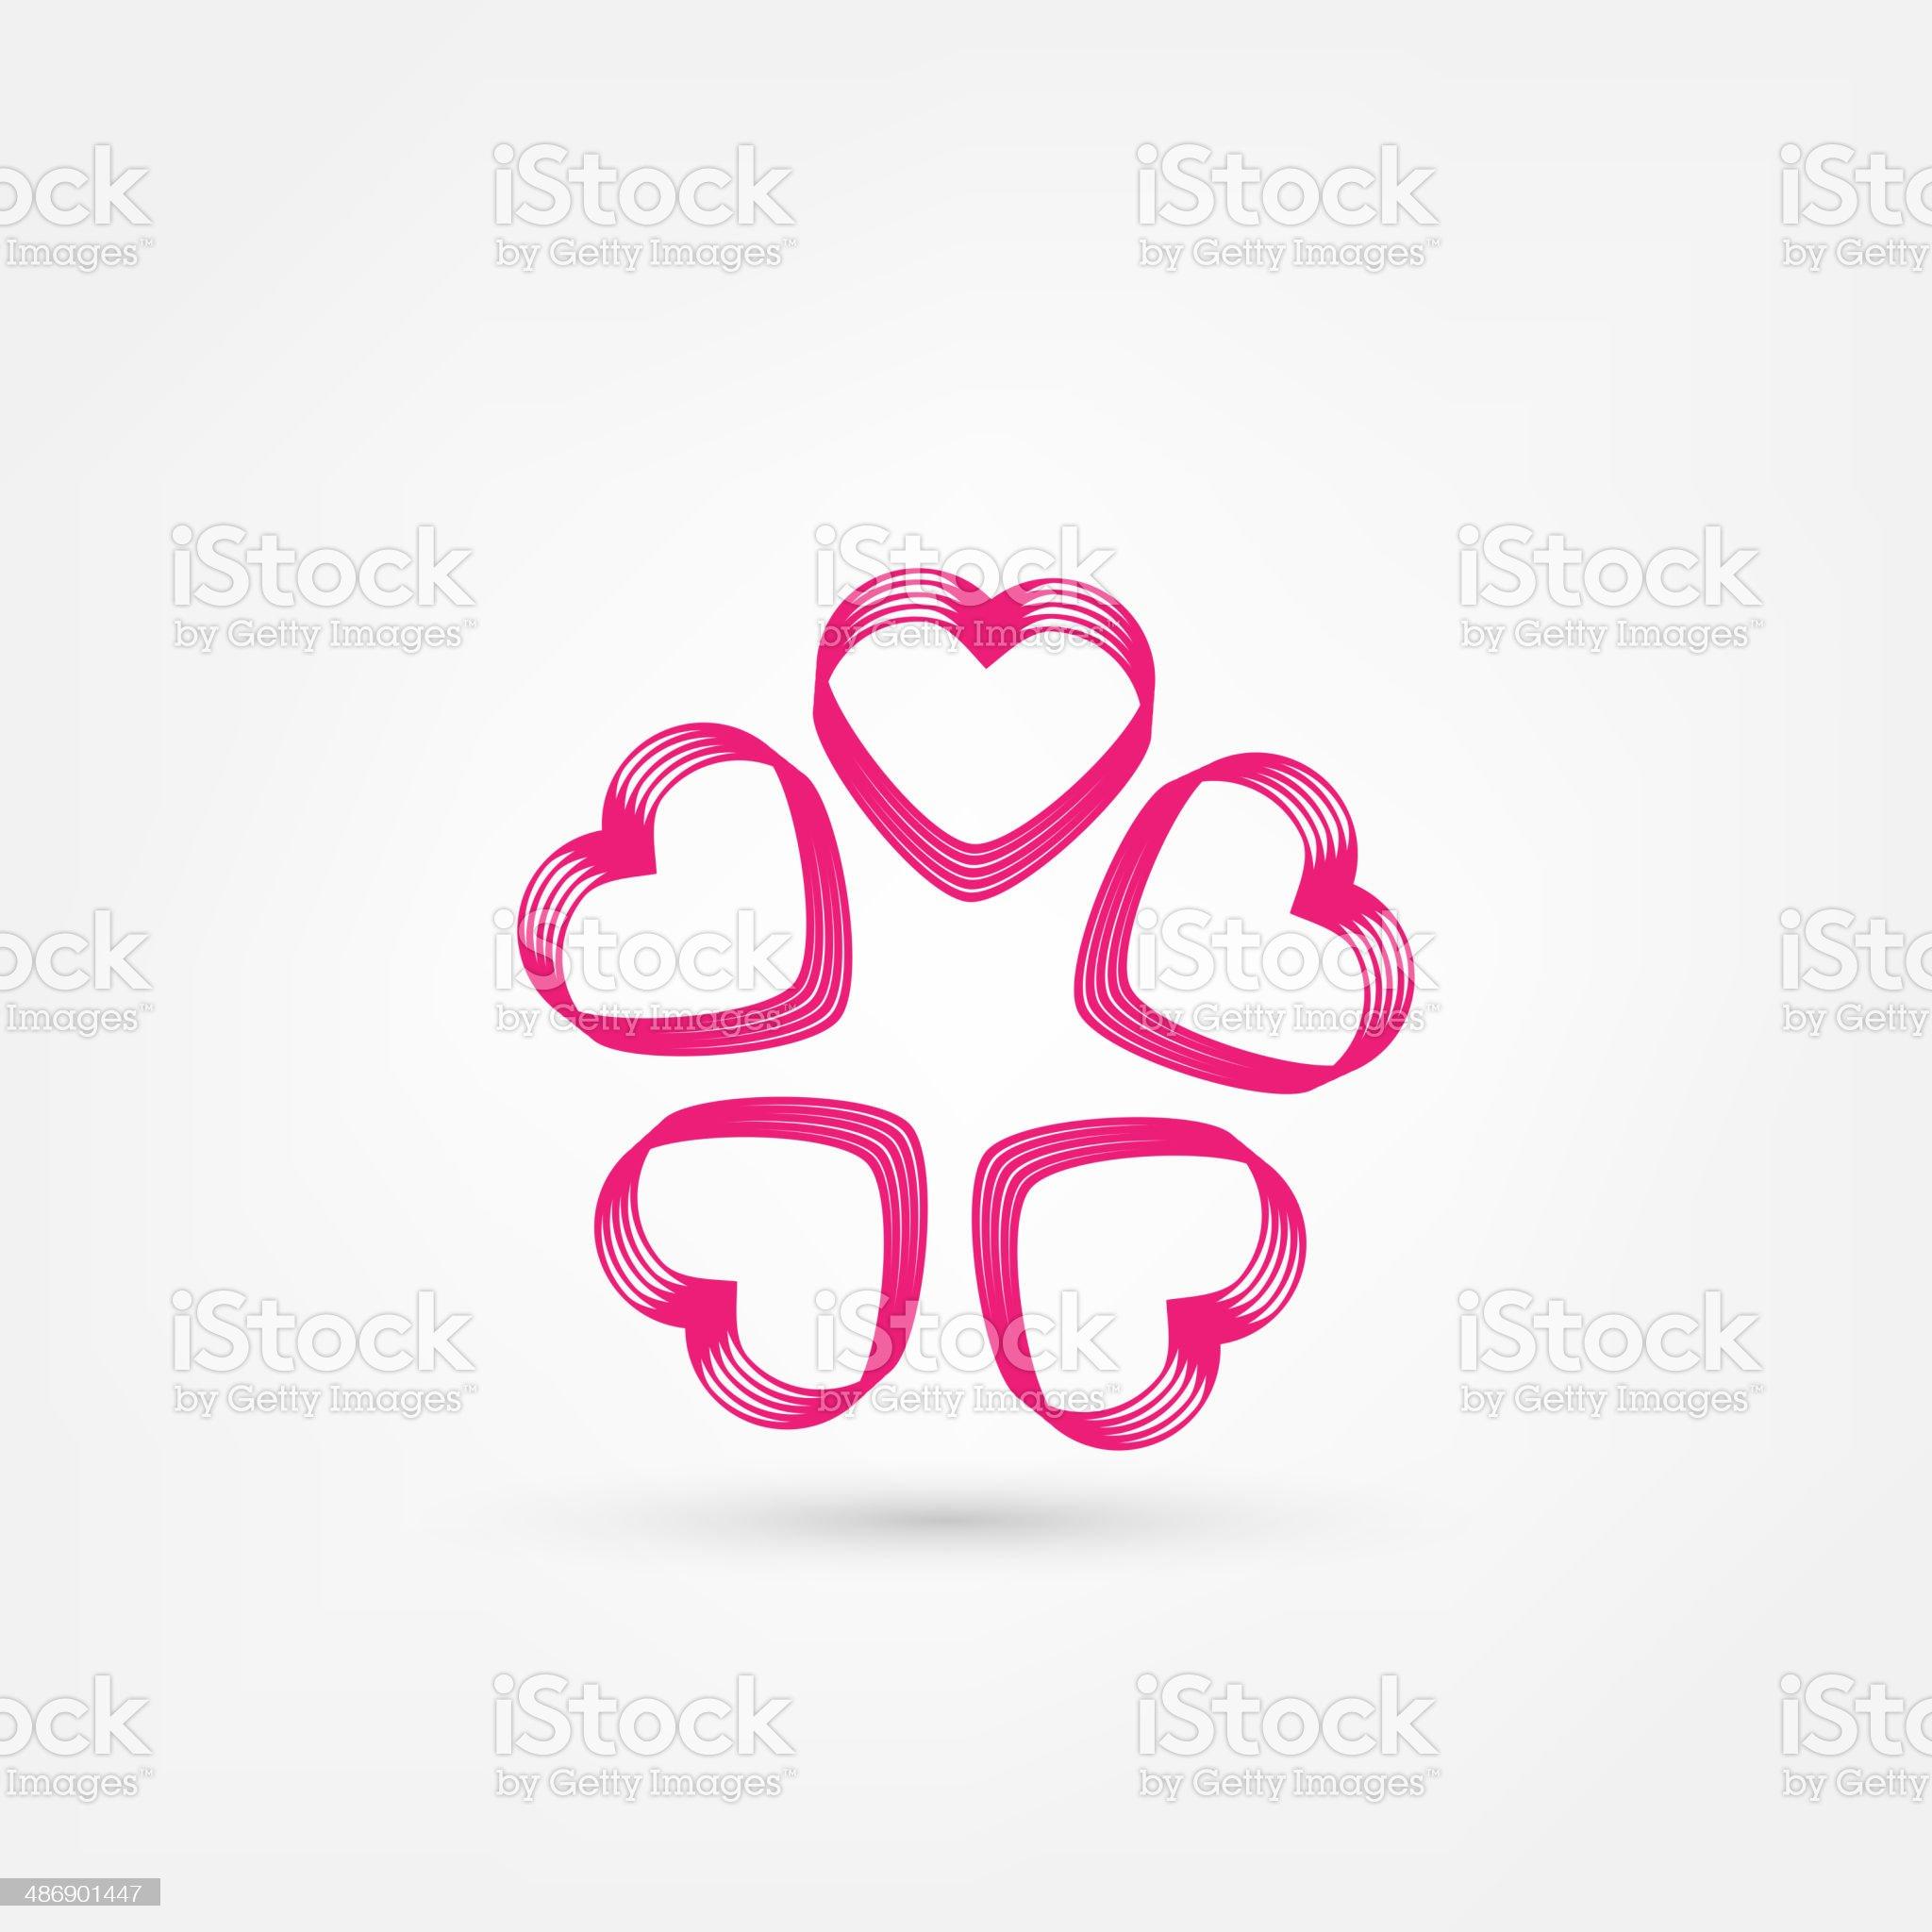 heart icon royalty-free stock vector art